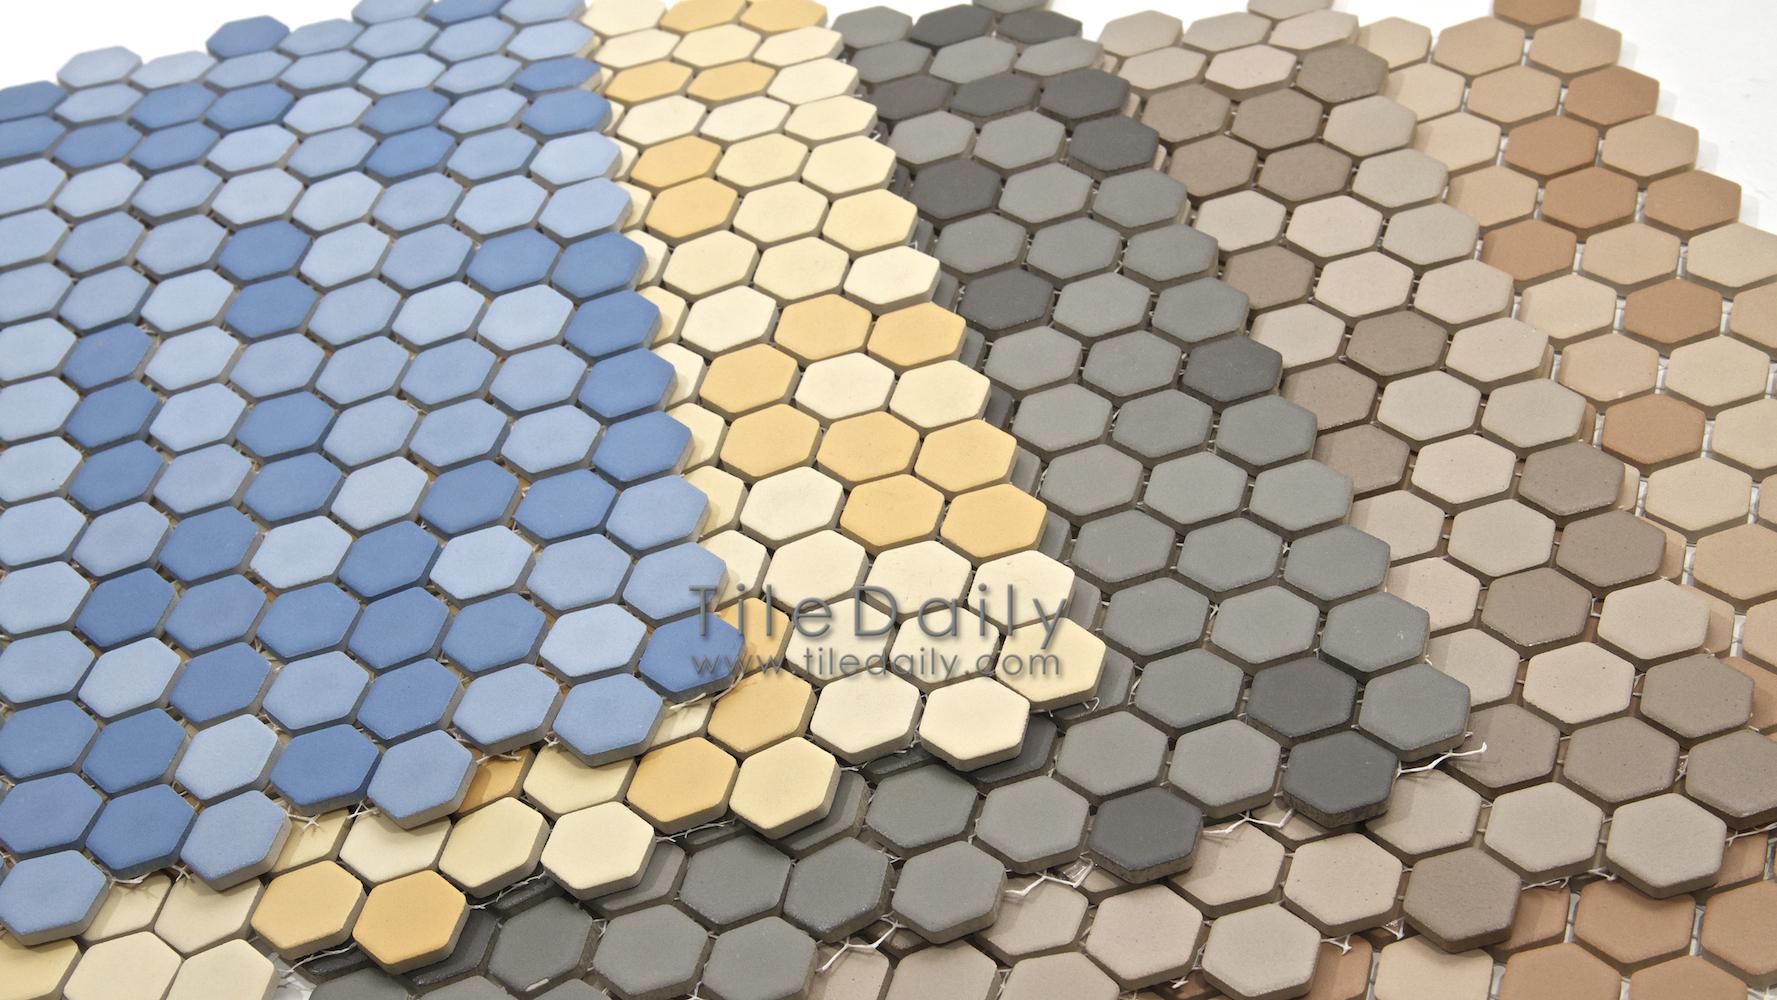 Porcelain Mosaic Tiledaily